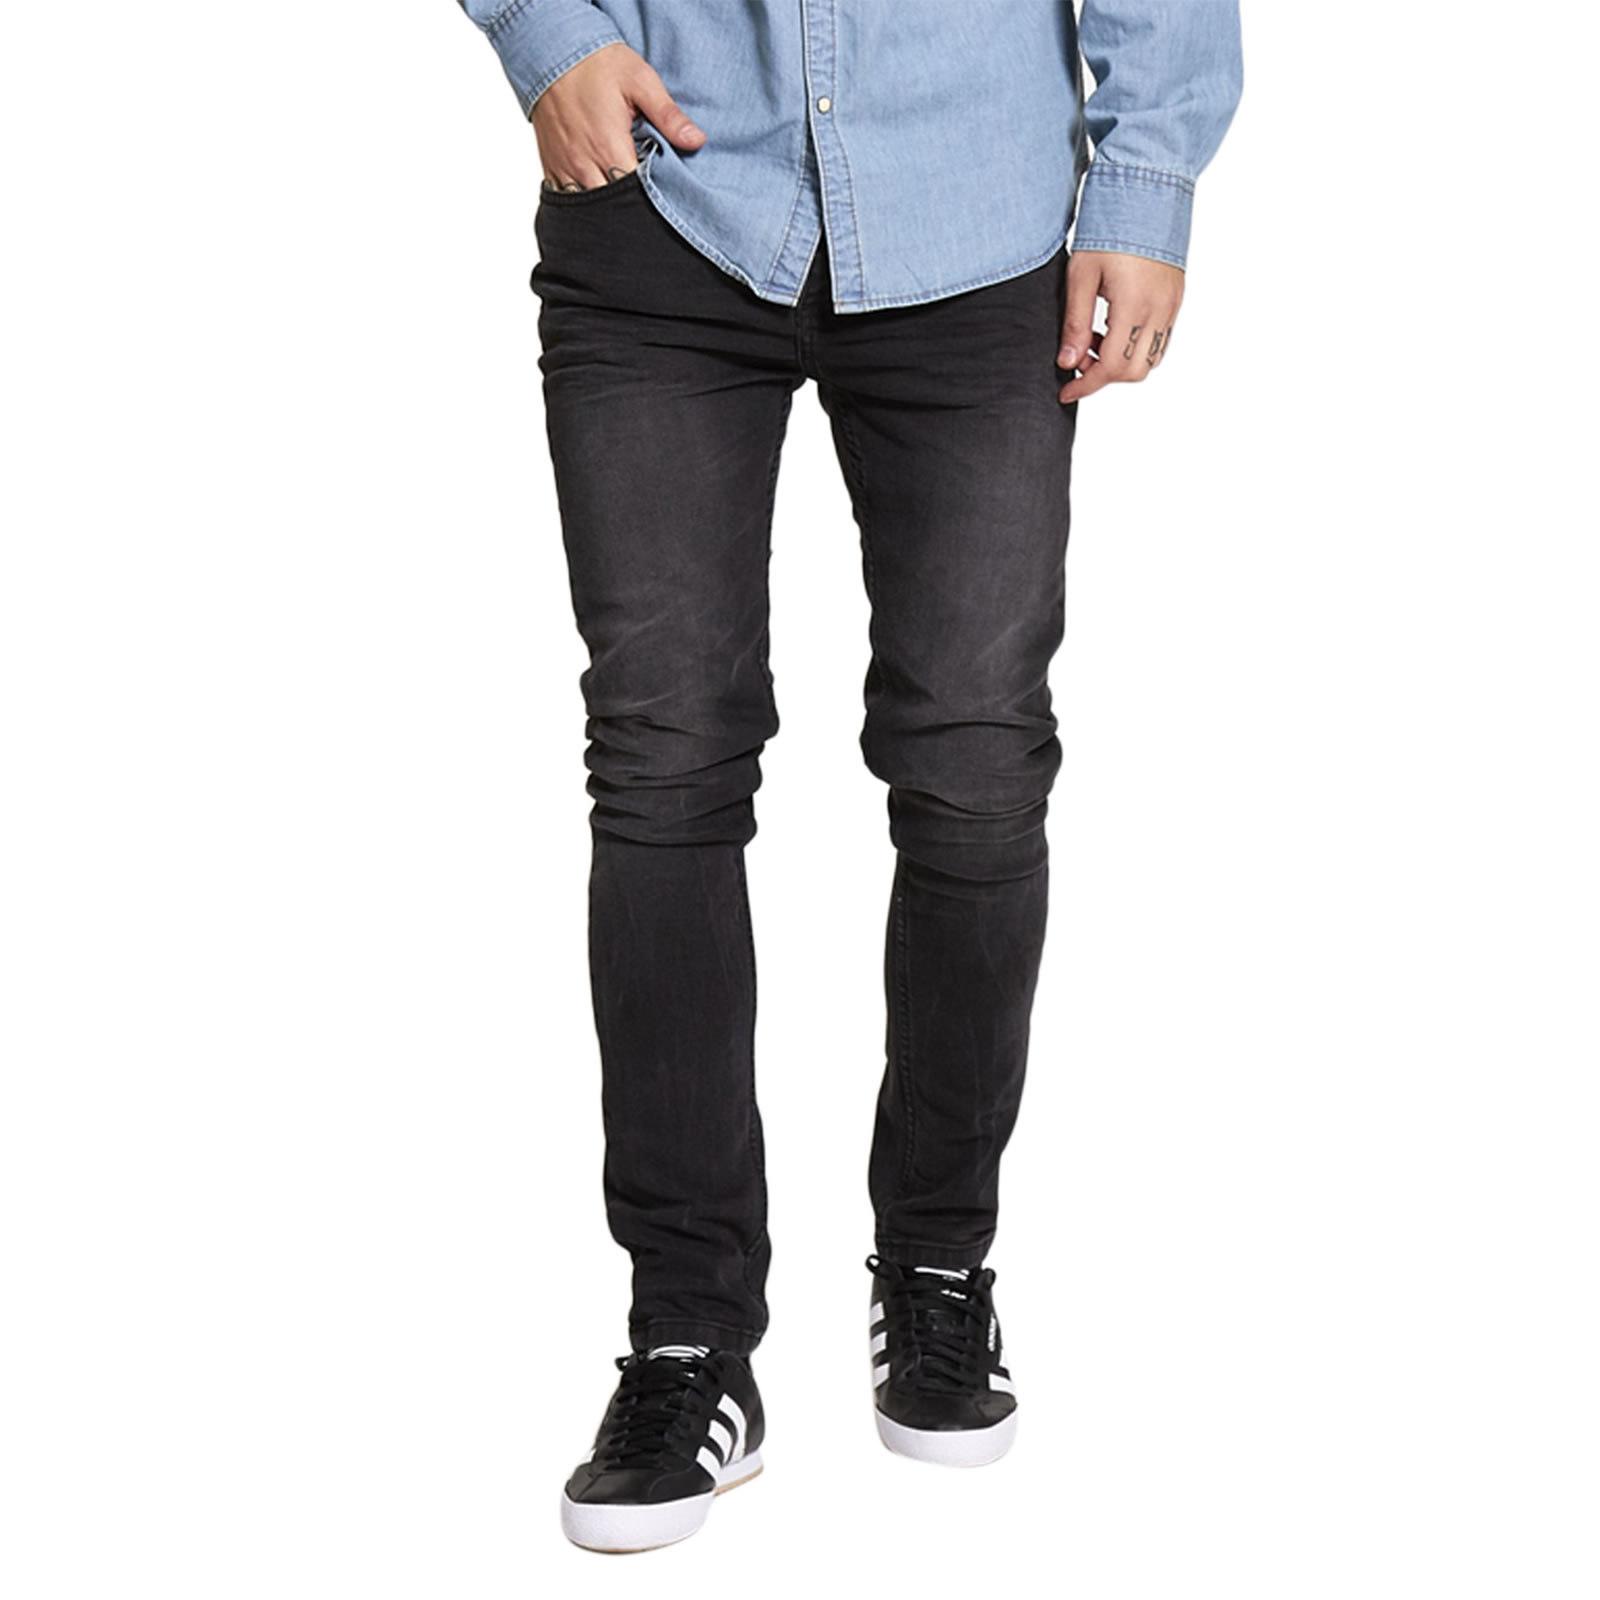 Mens Jeans 34x28